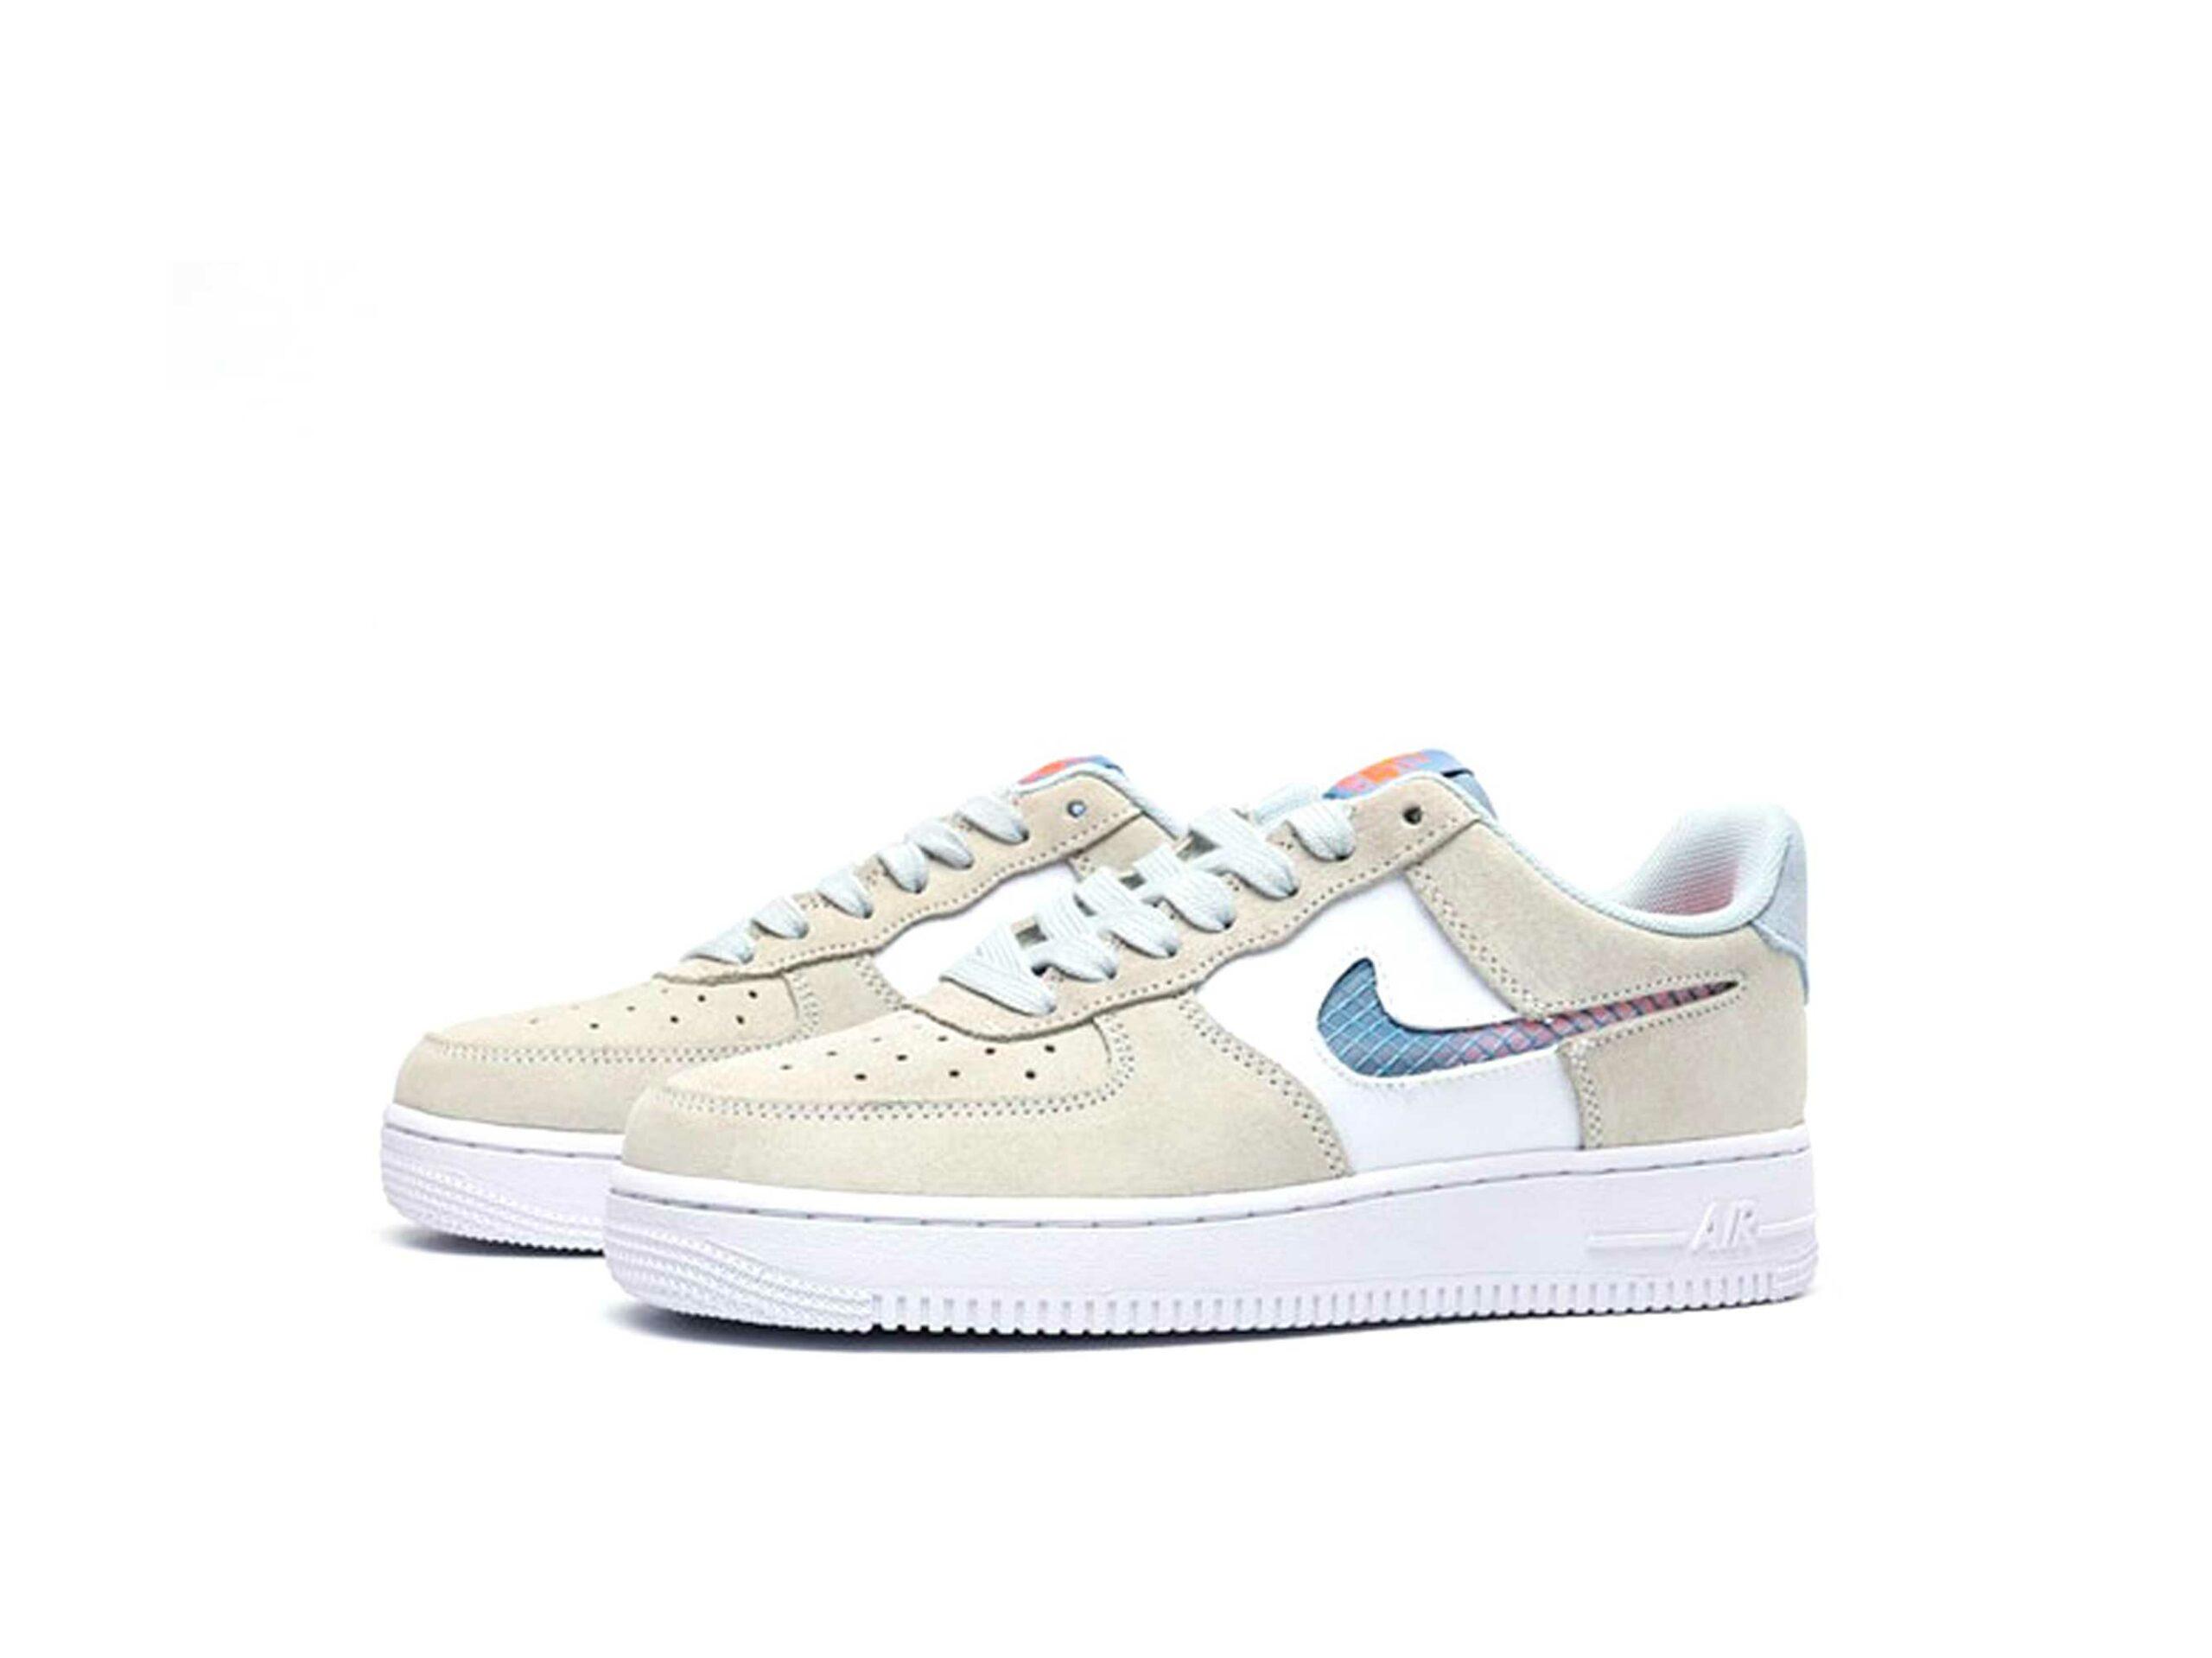 Nike Air Force 1 Low Couple Cj4093_001 купить